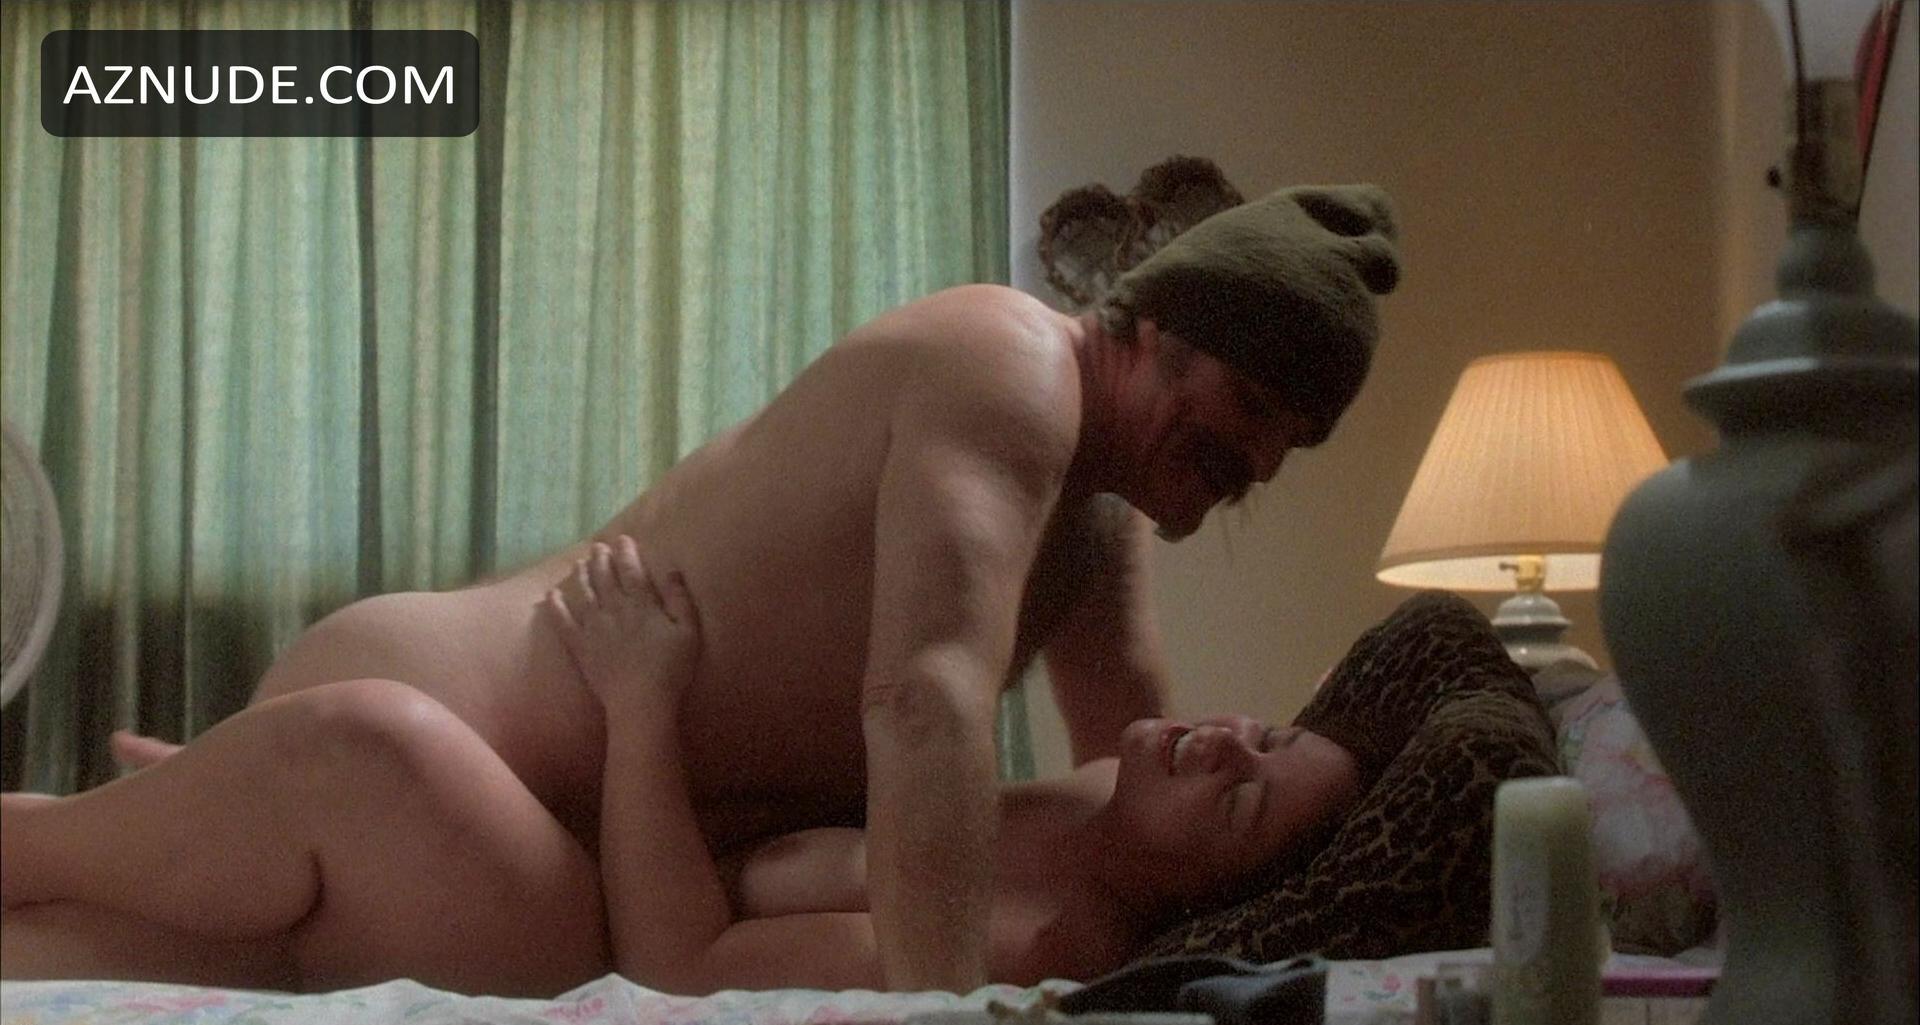 Sideways sex scene video clip